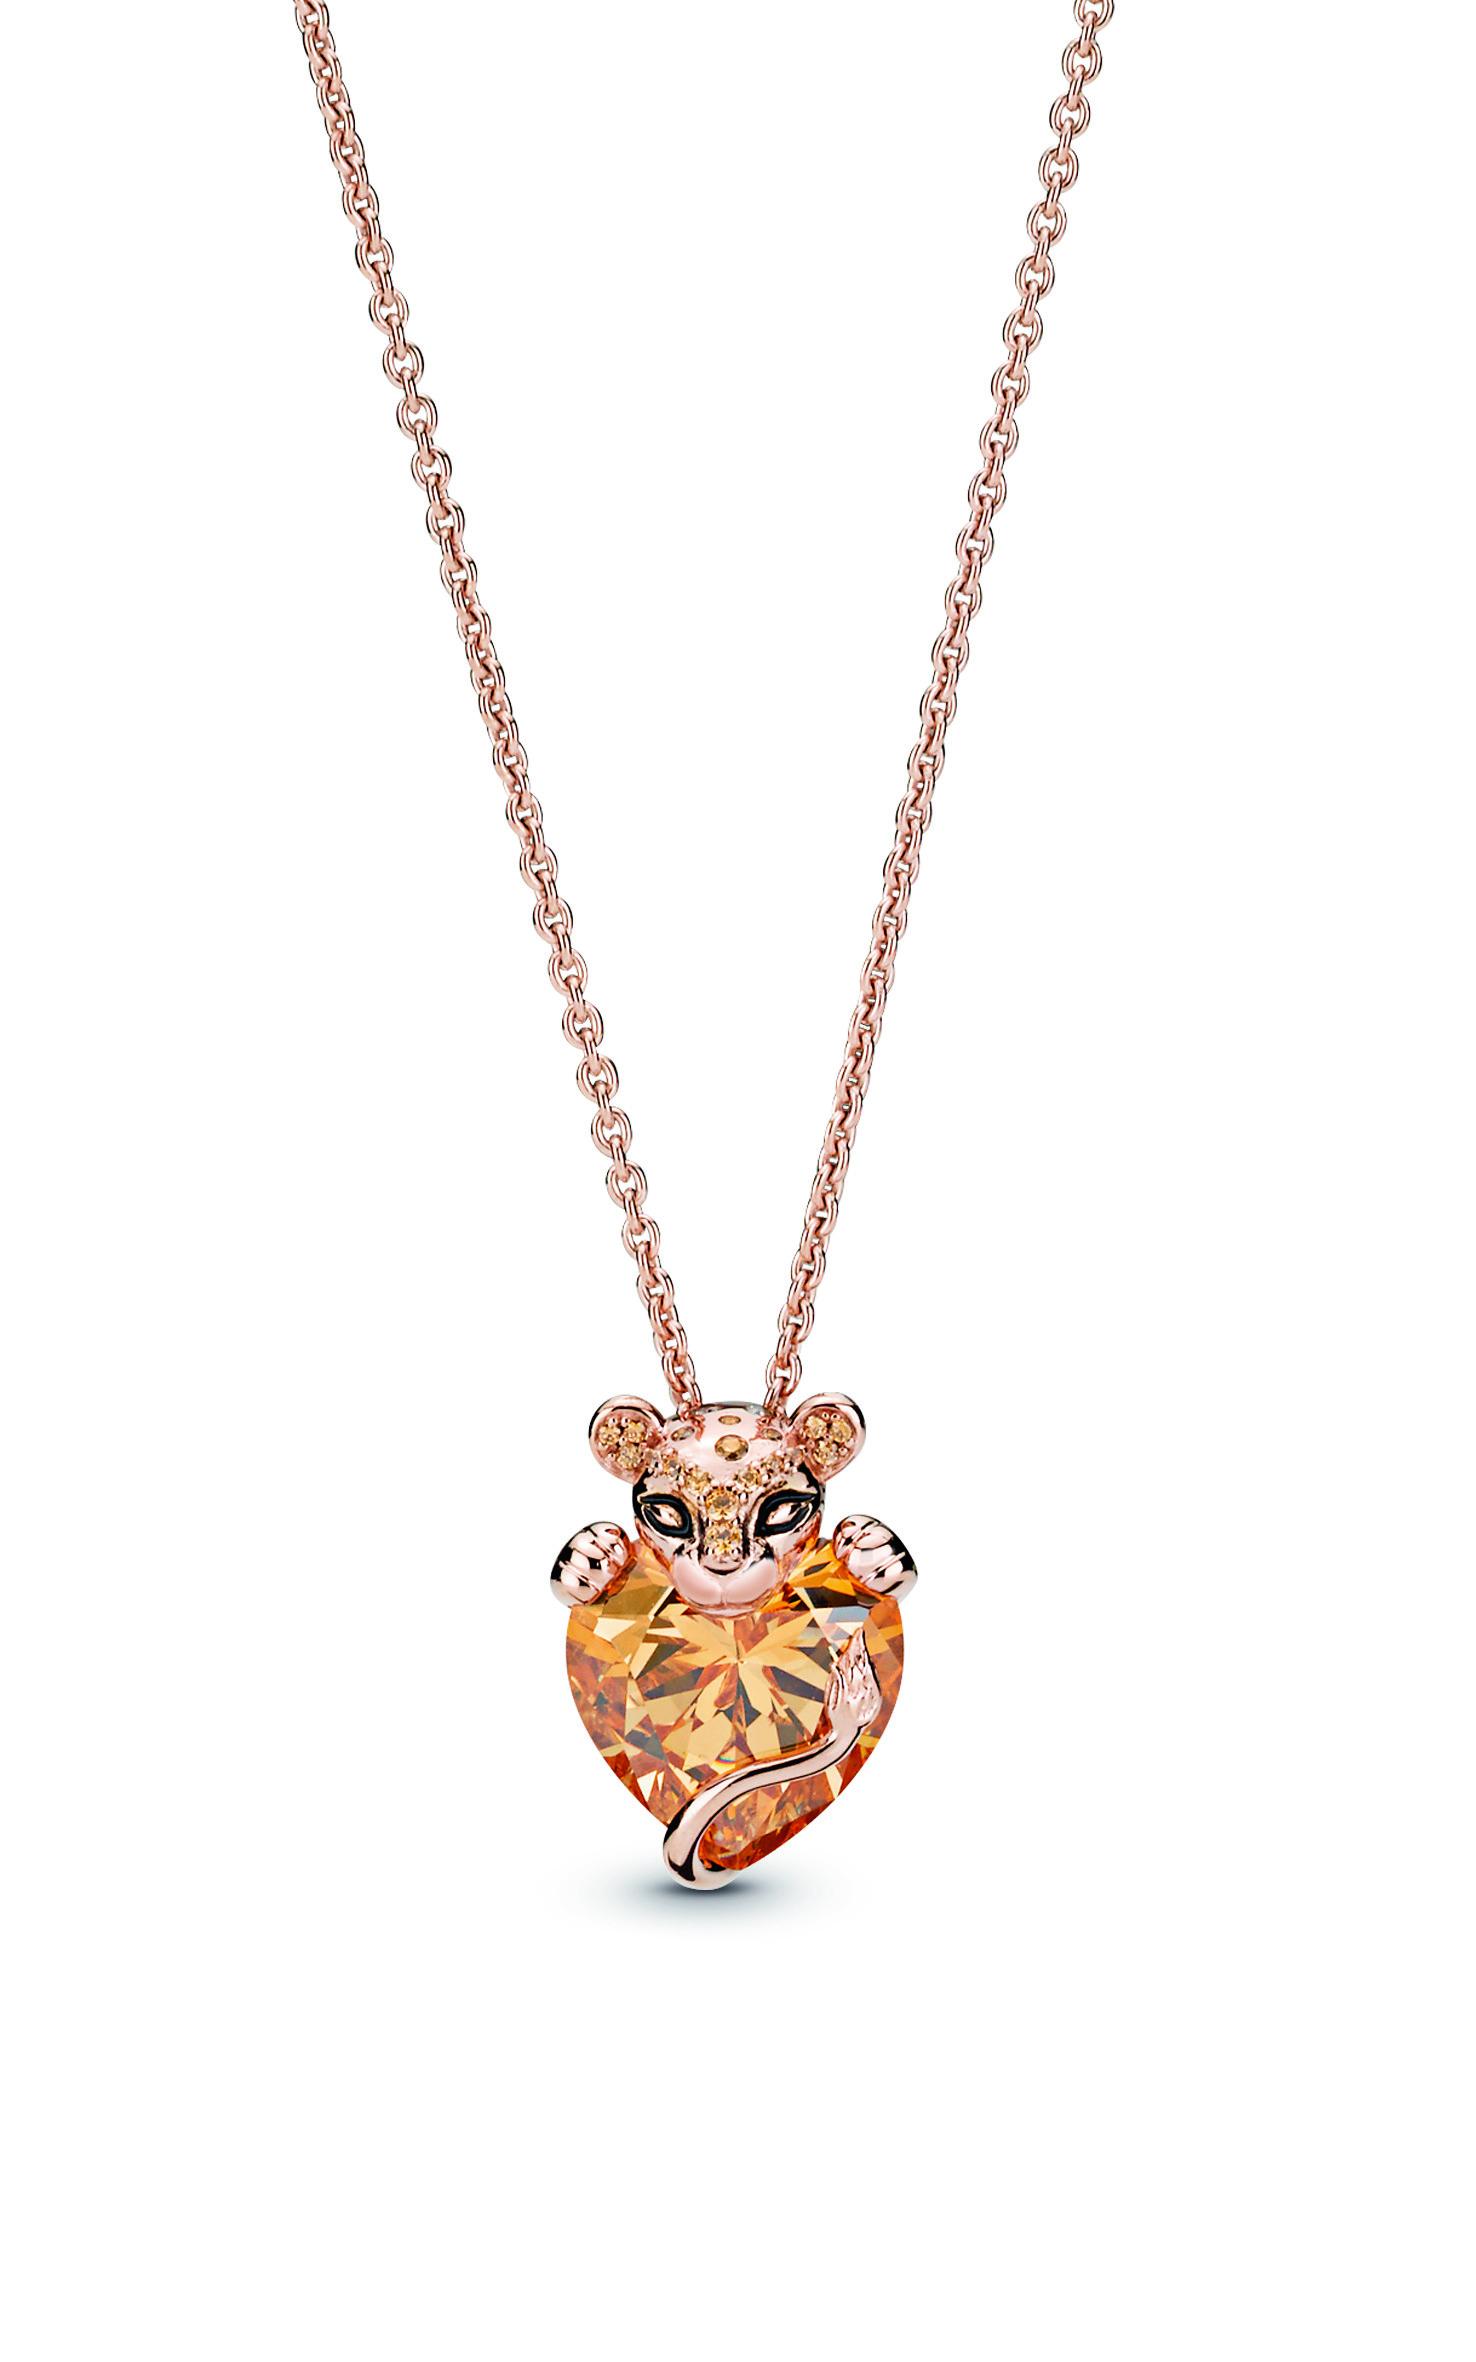 Buy Sparkling Lion Princess Heart Necklace Pandora Rose™ 388068Czm Throughout Most Current Matte Brilliance Heart Pendant Necklaces (View 21 of 25)